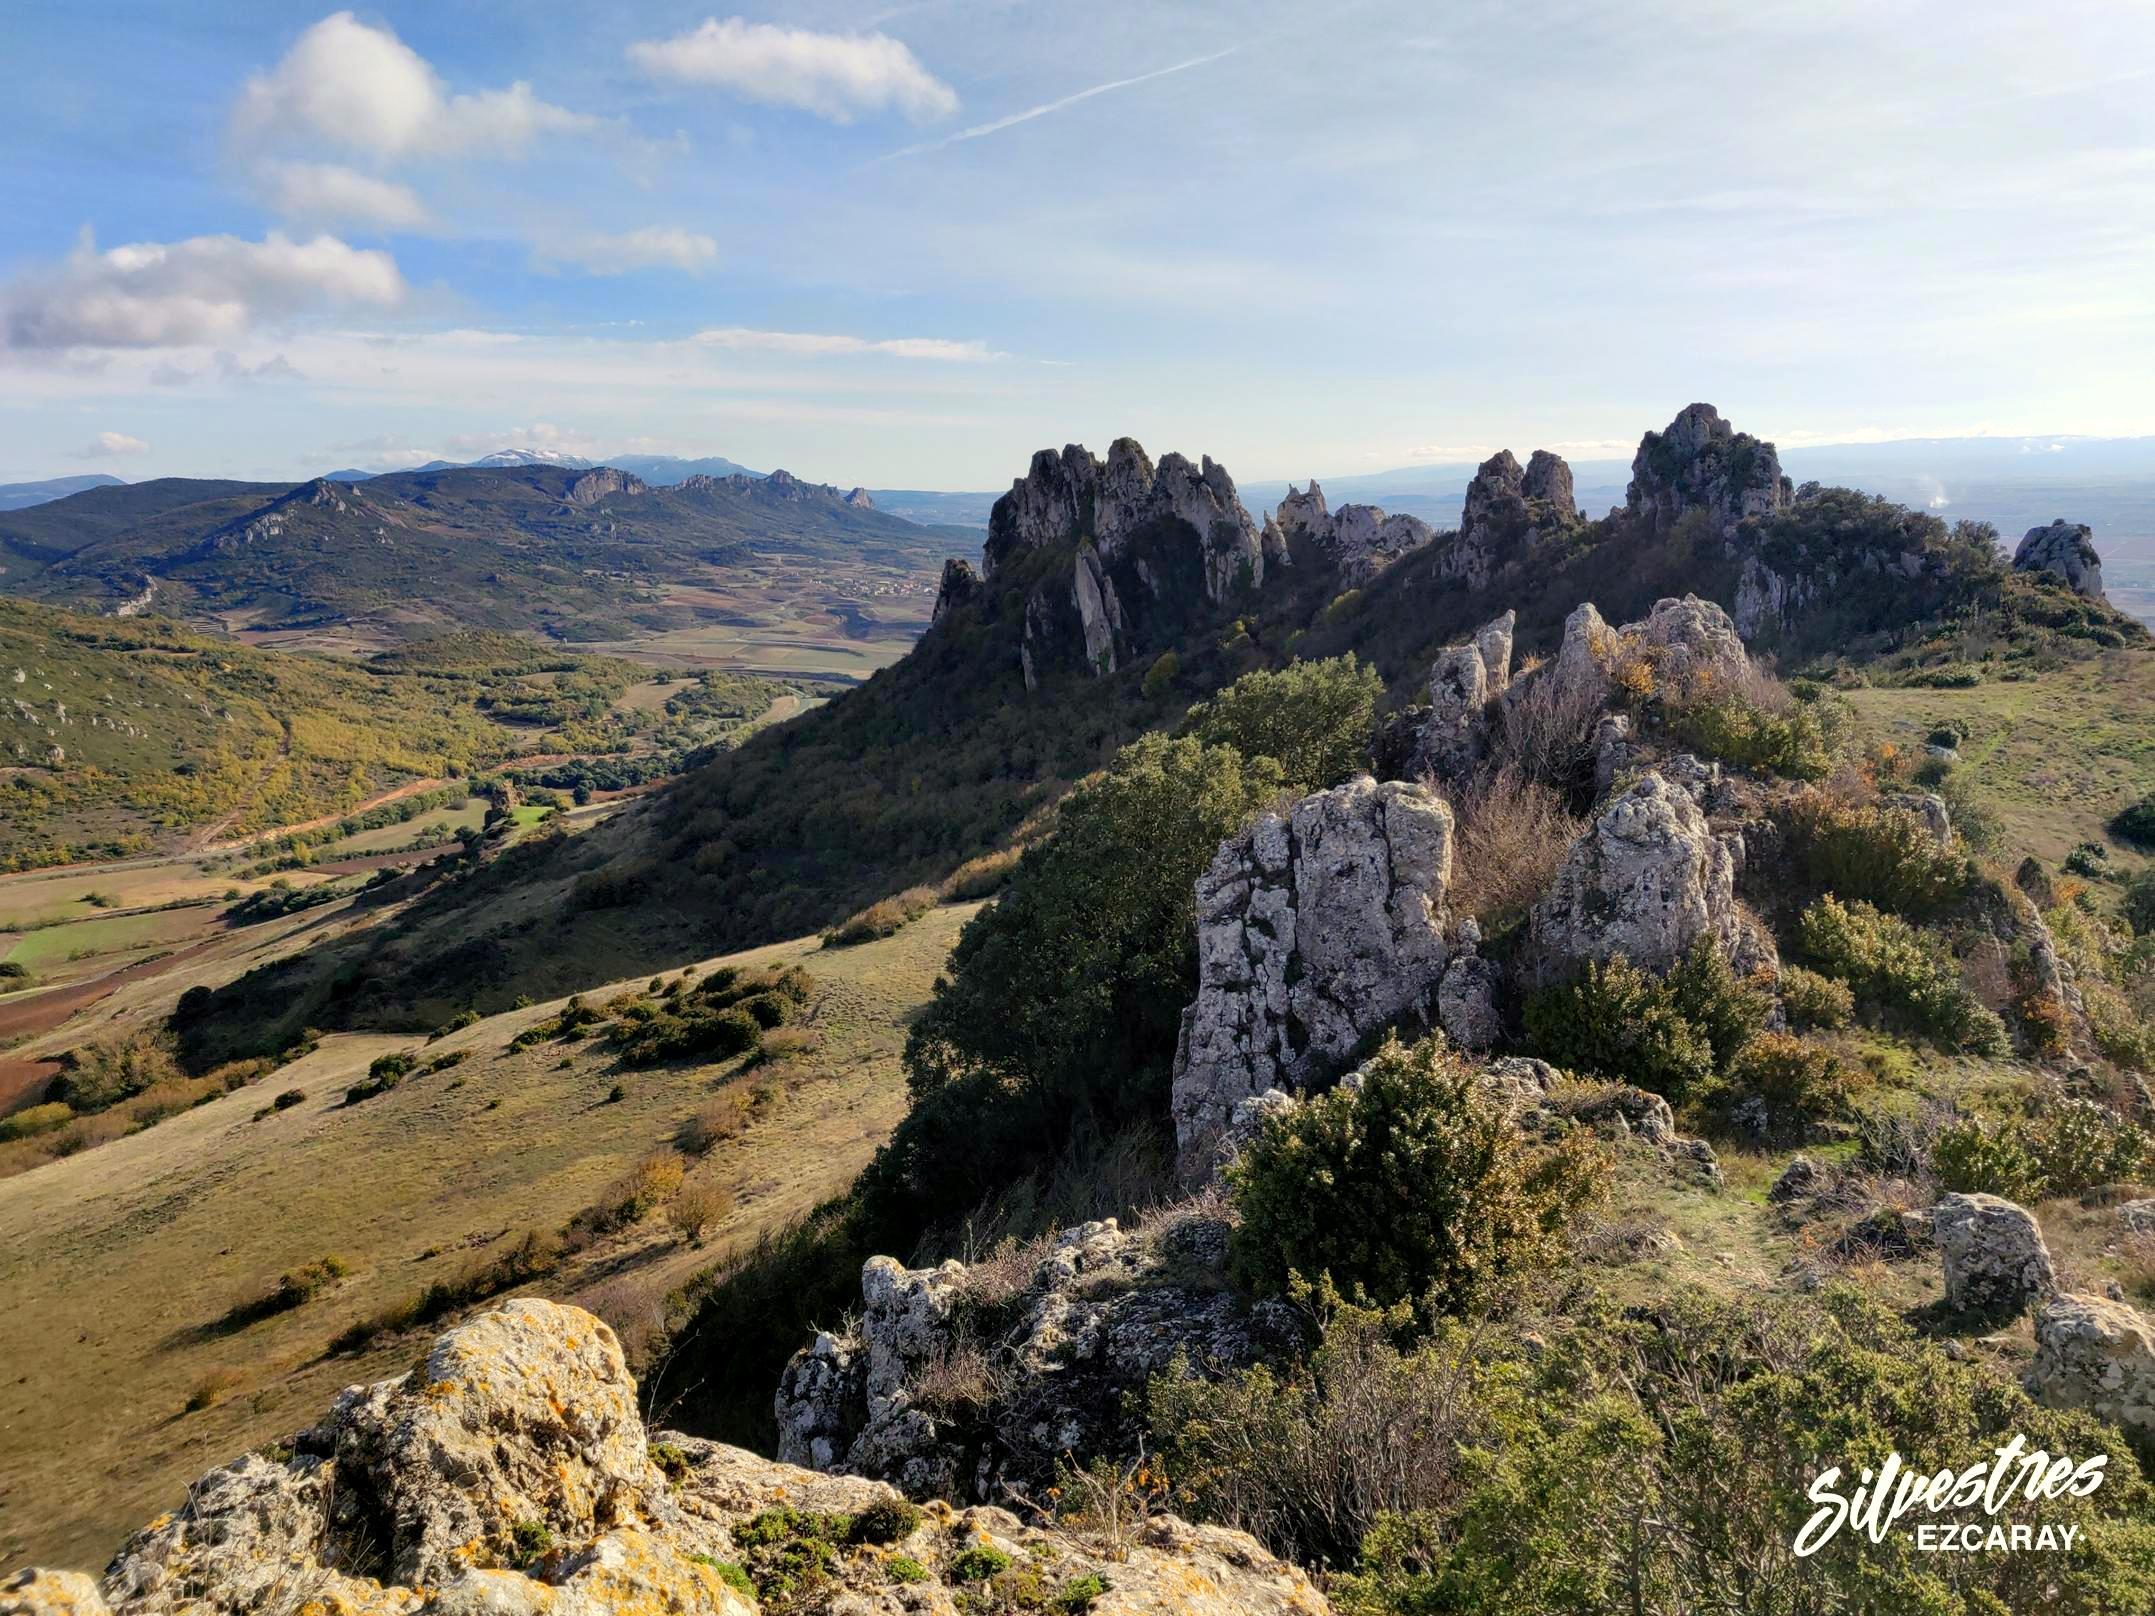 obarenes_sierra_cantabria_toloño_geología_relieve_paisajes_guia_montaña